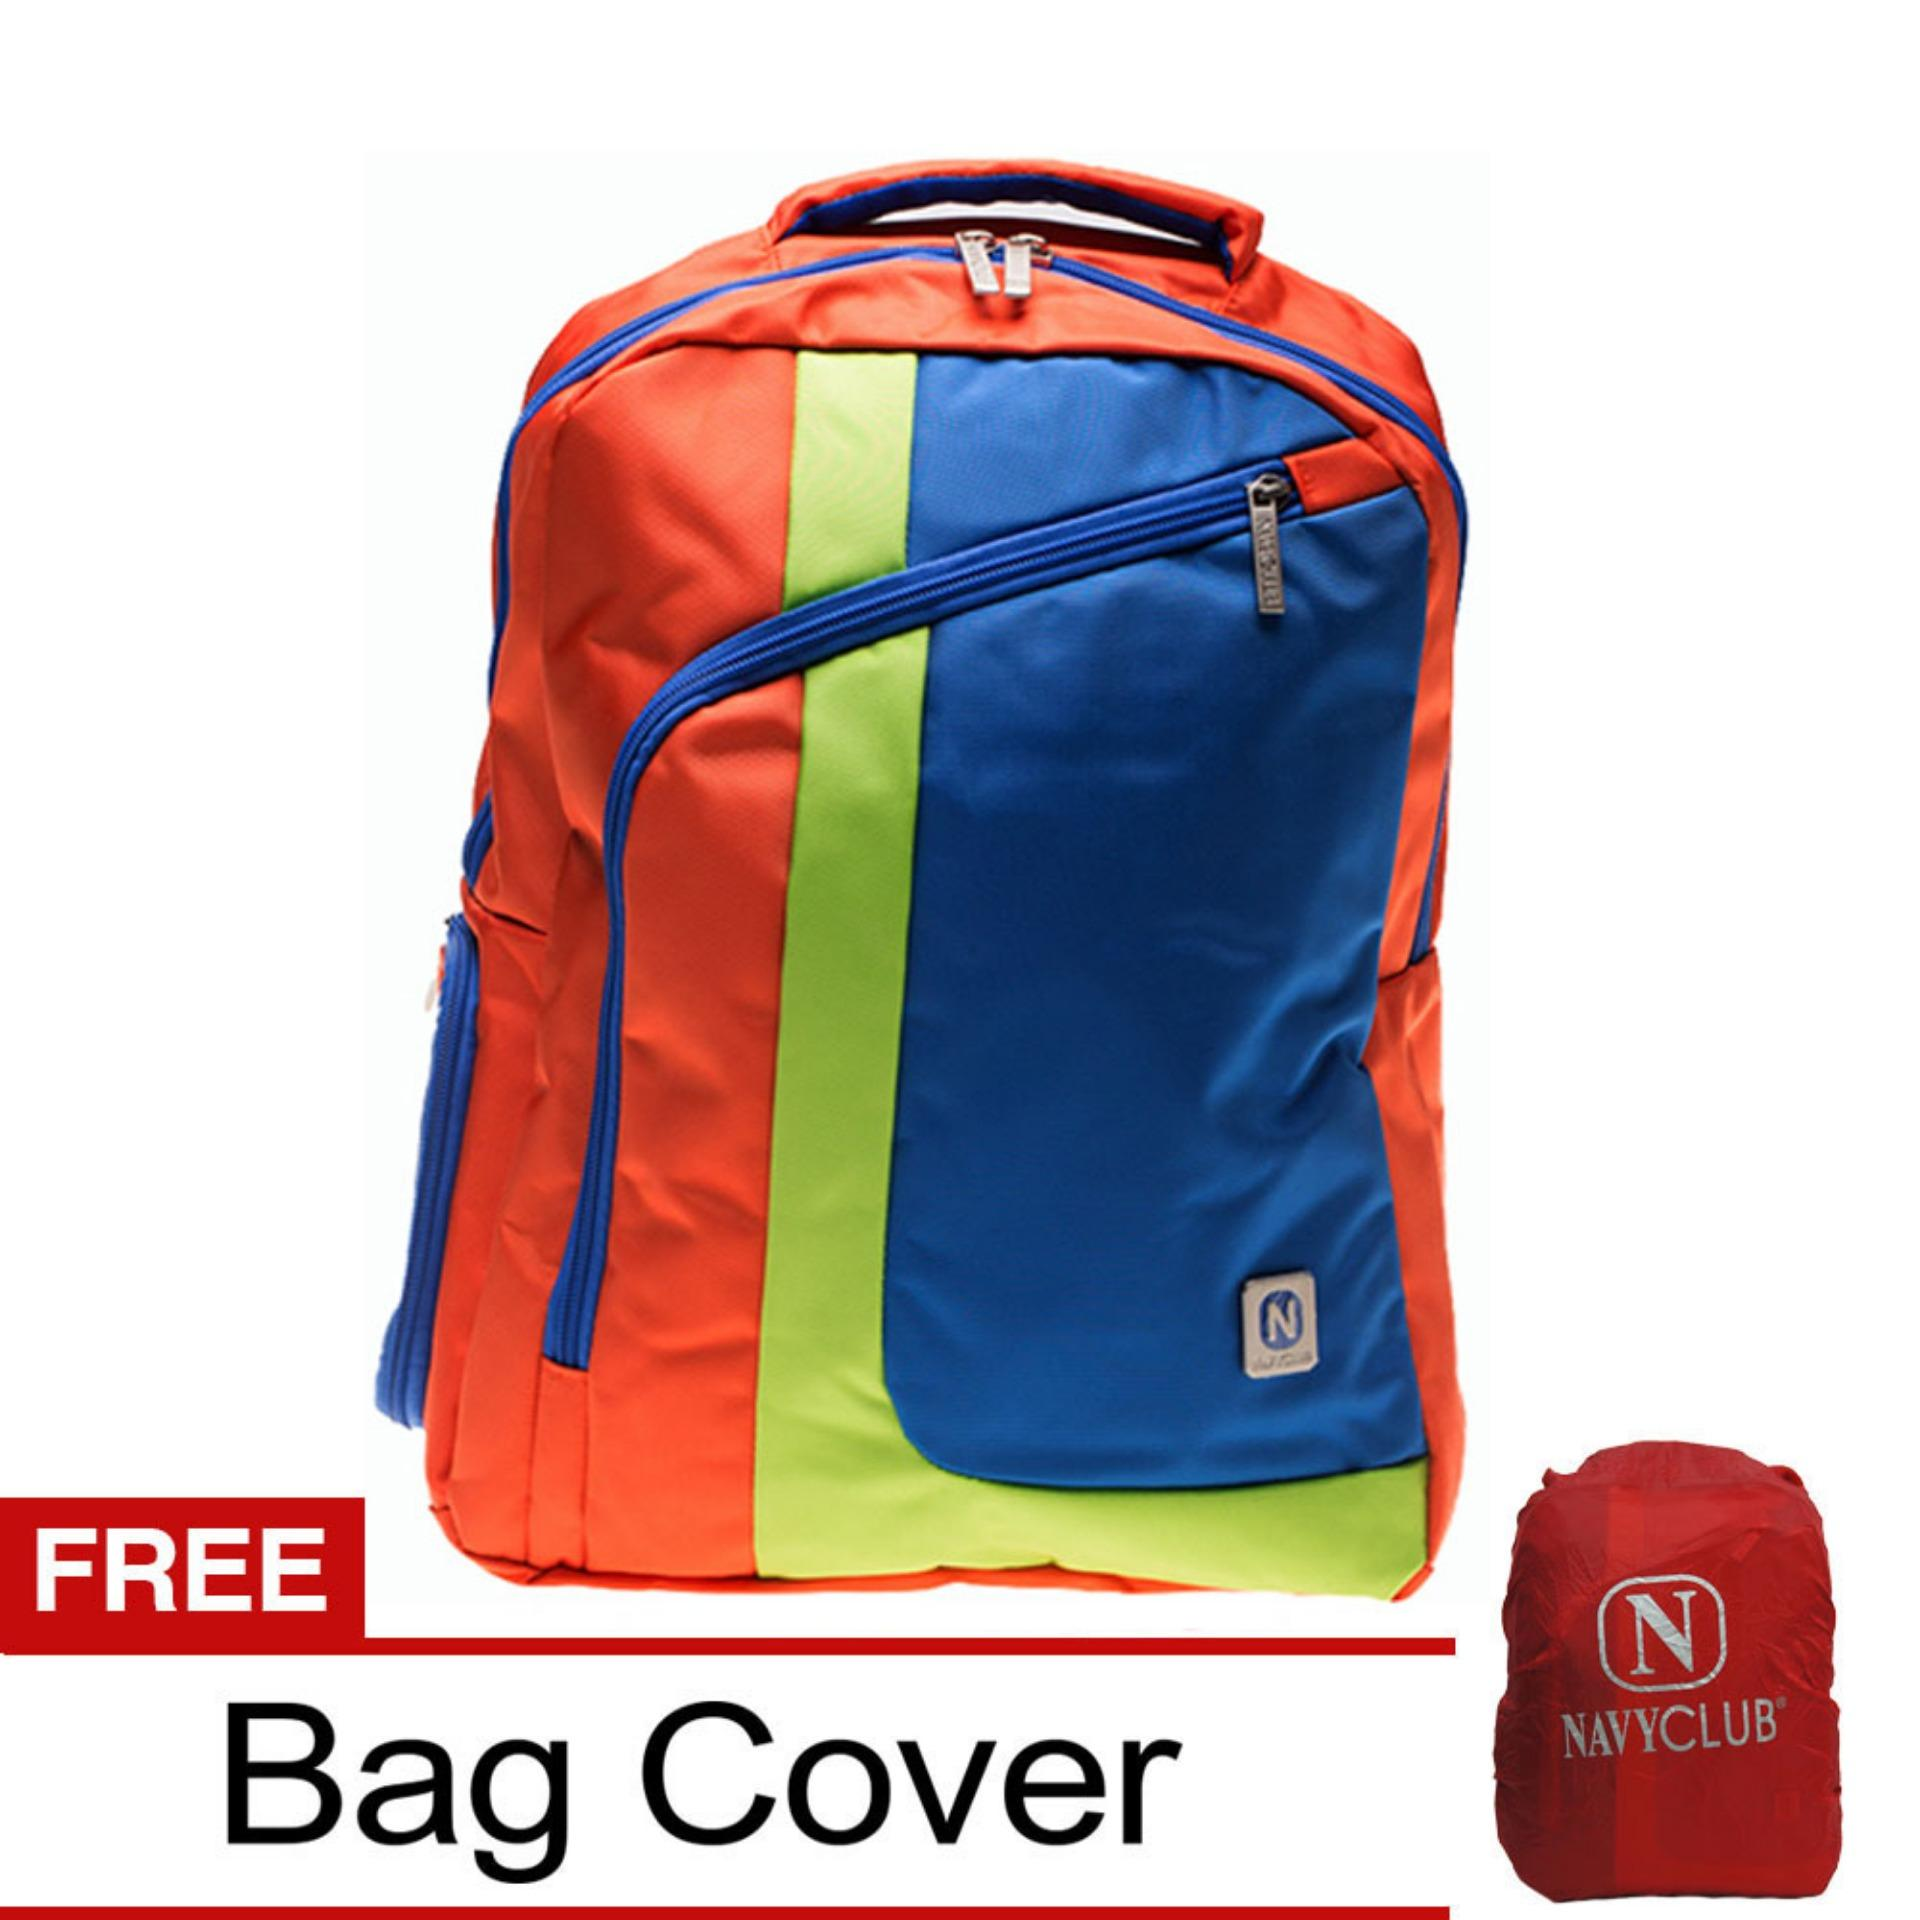 Spesifikasi Navy Club Tas Ransel Laptop Kasual 3260 Tas Pria Tas Wanita Tas Laptop Backpack Up To 15 Inch Bonus Bag Cover Orange B Navy Club Terbaru